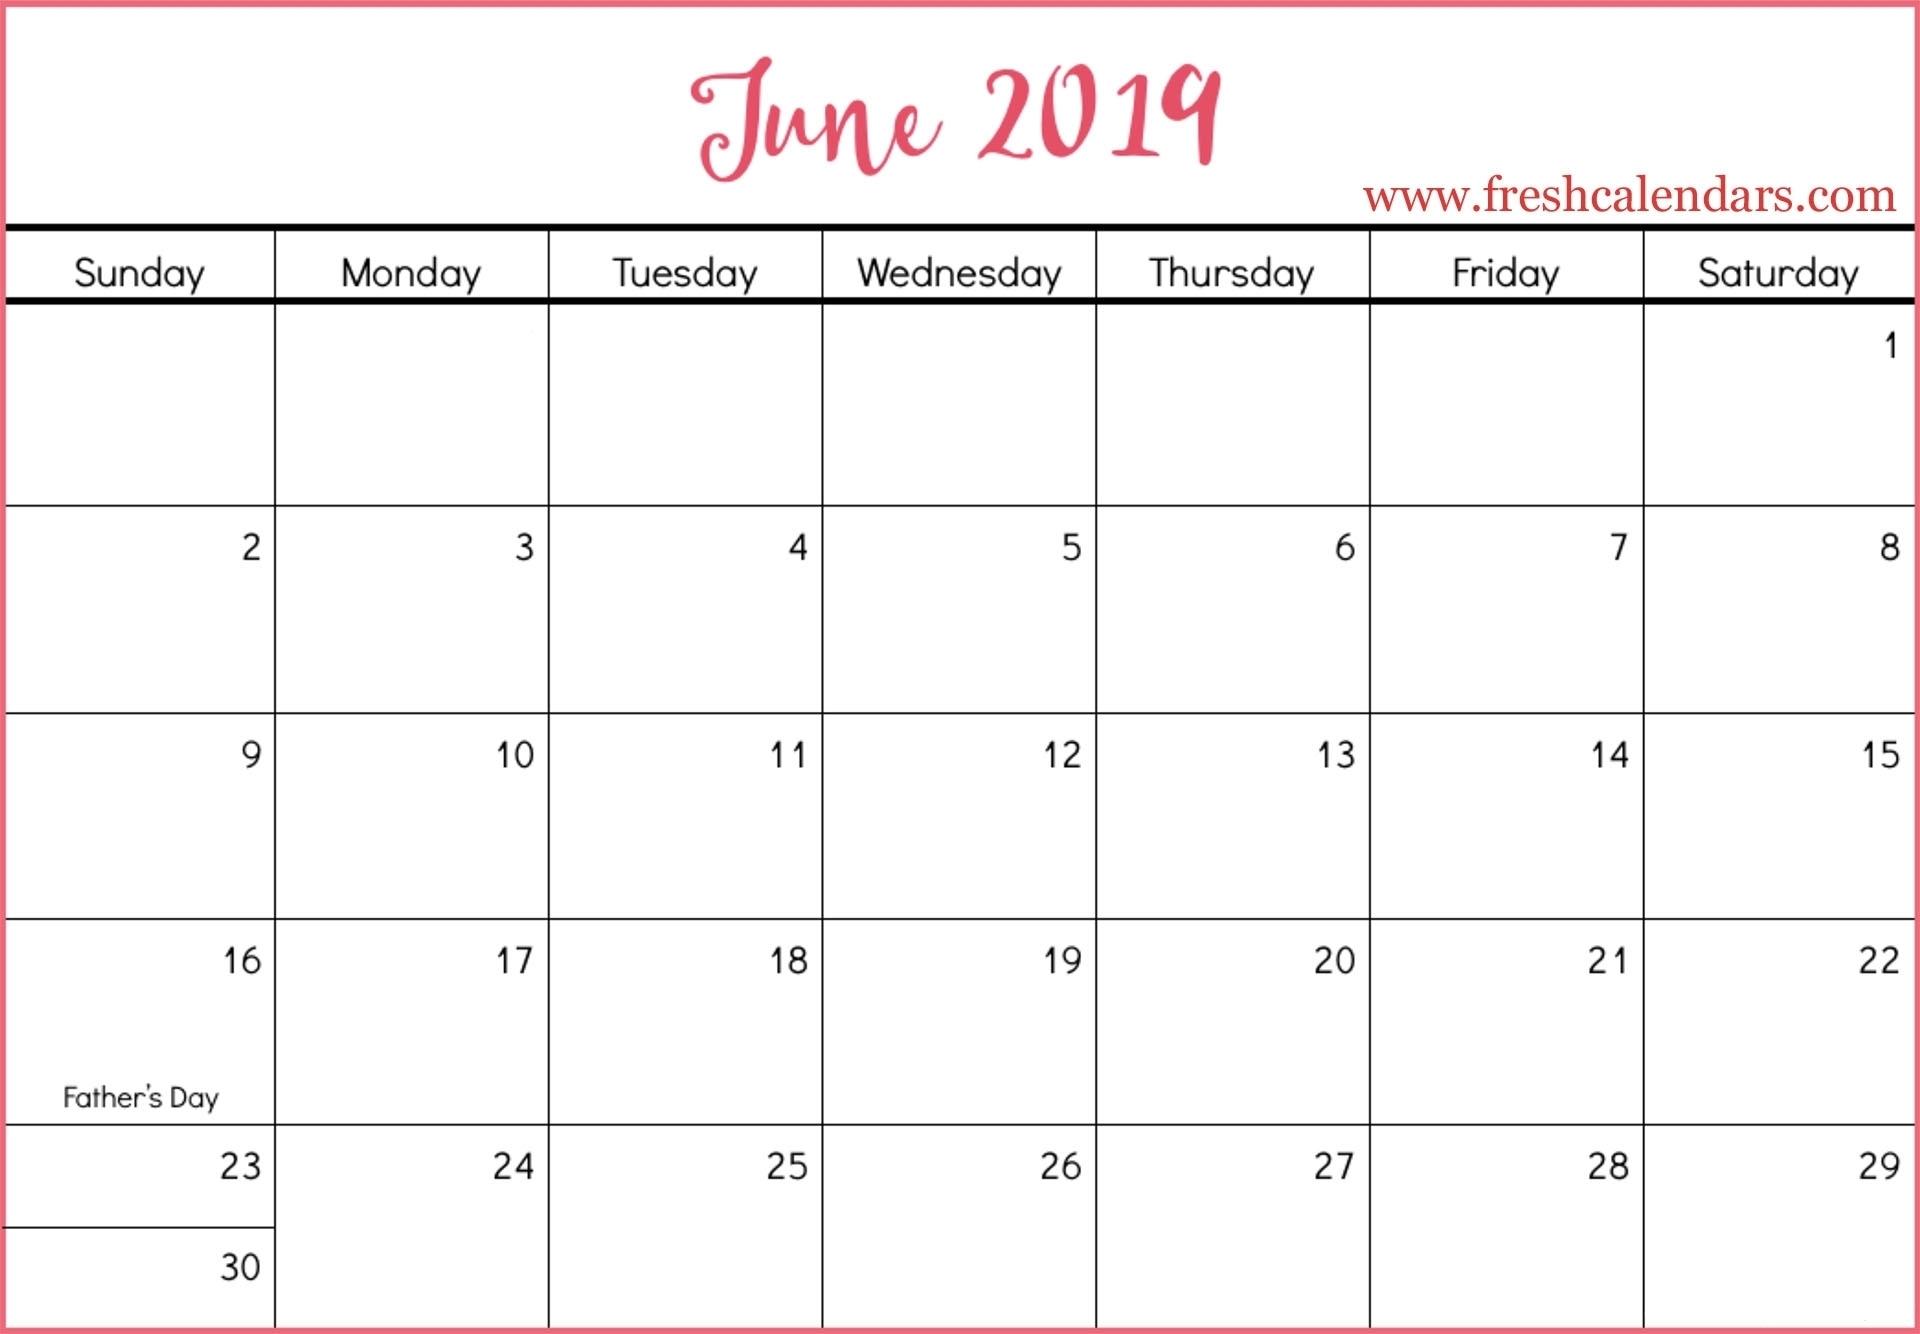 Calendar Of June 2019 | Template Calendar Printable for Ramadan Fasting Calendar Millville Nj